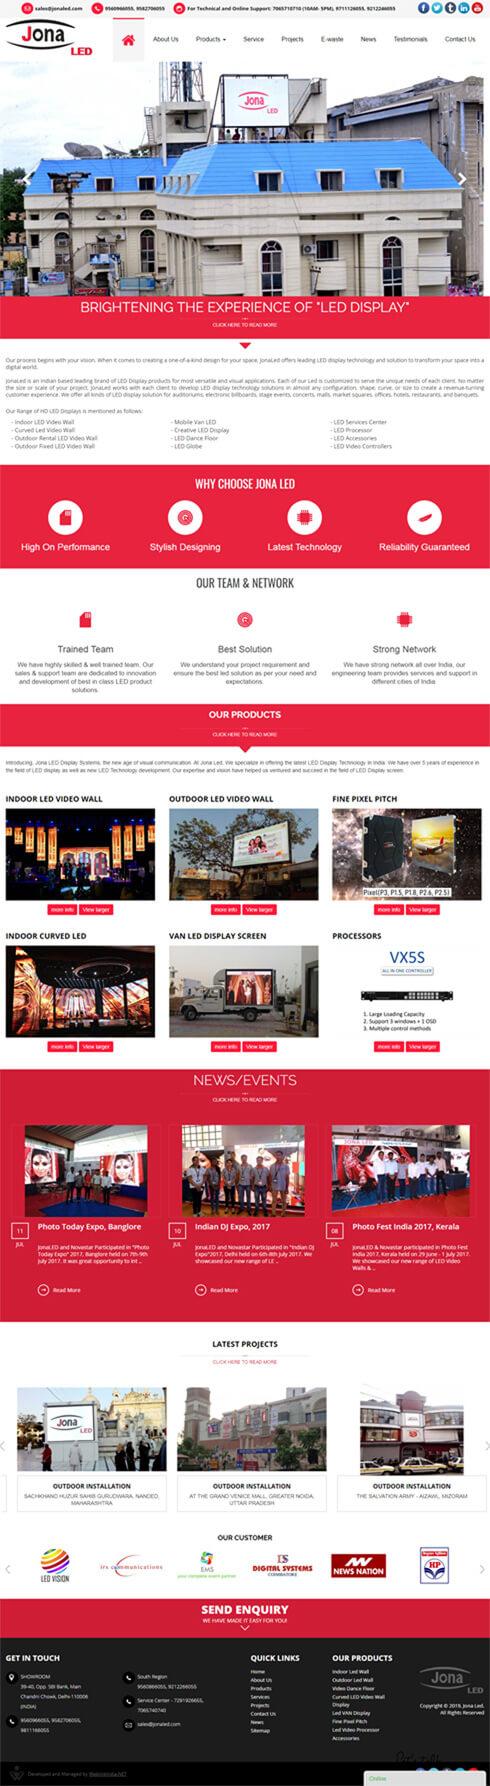 Jona Led India Web Design